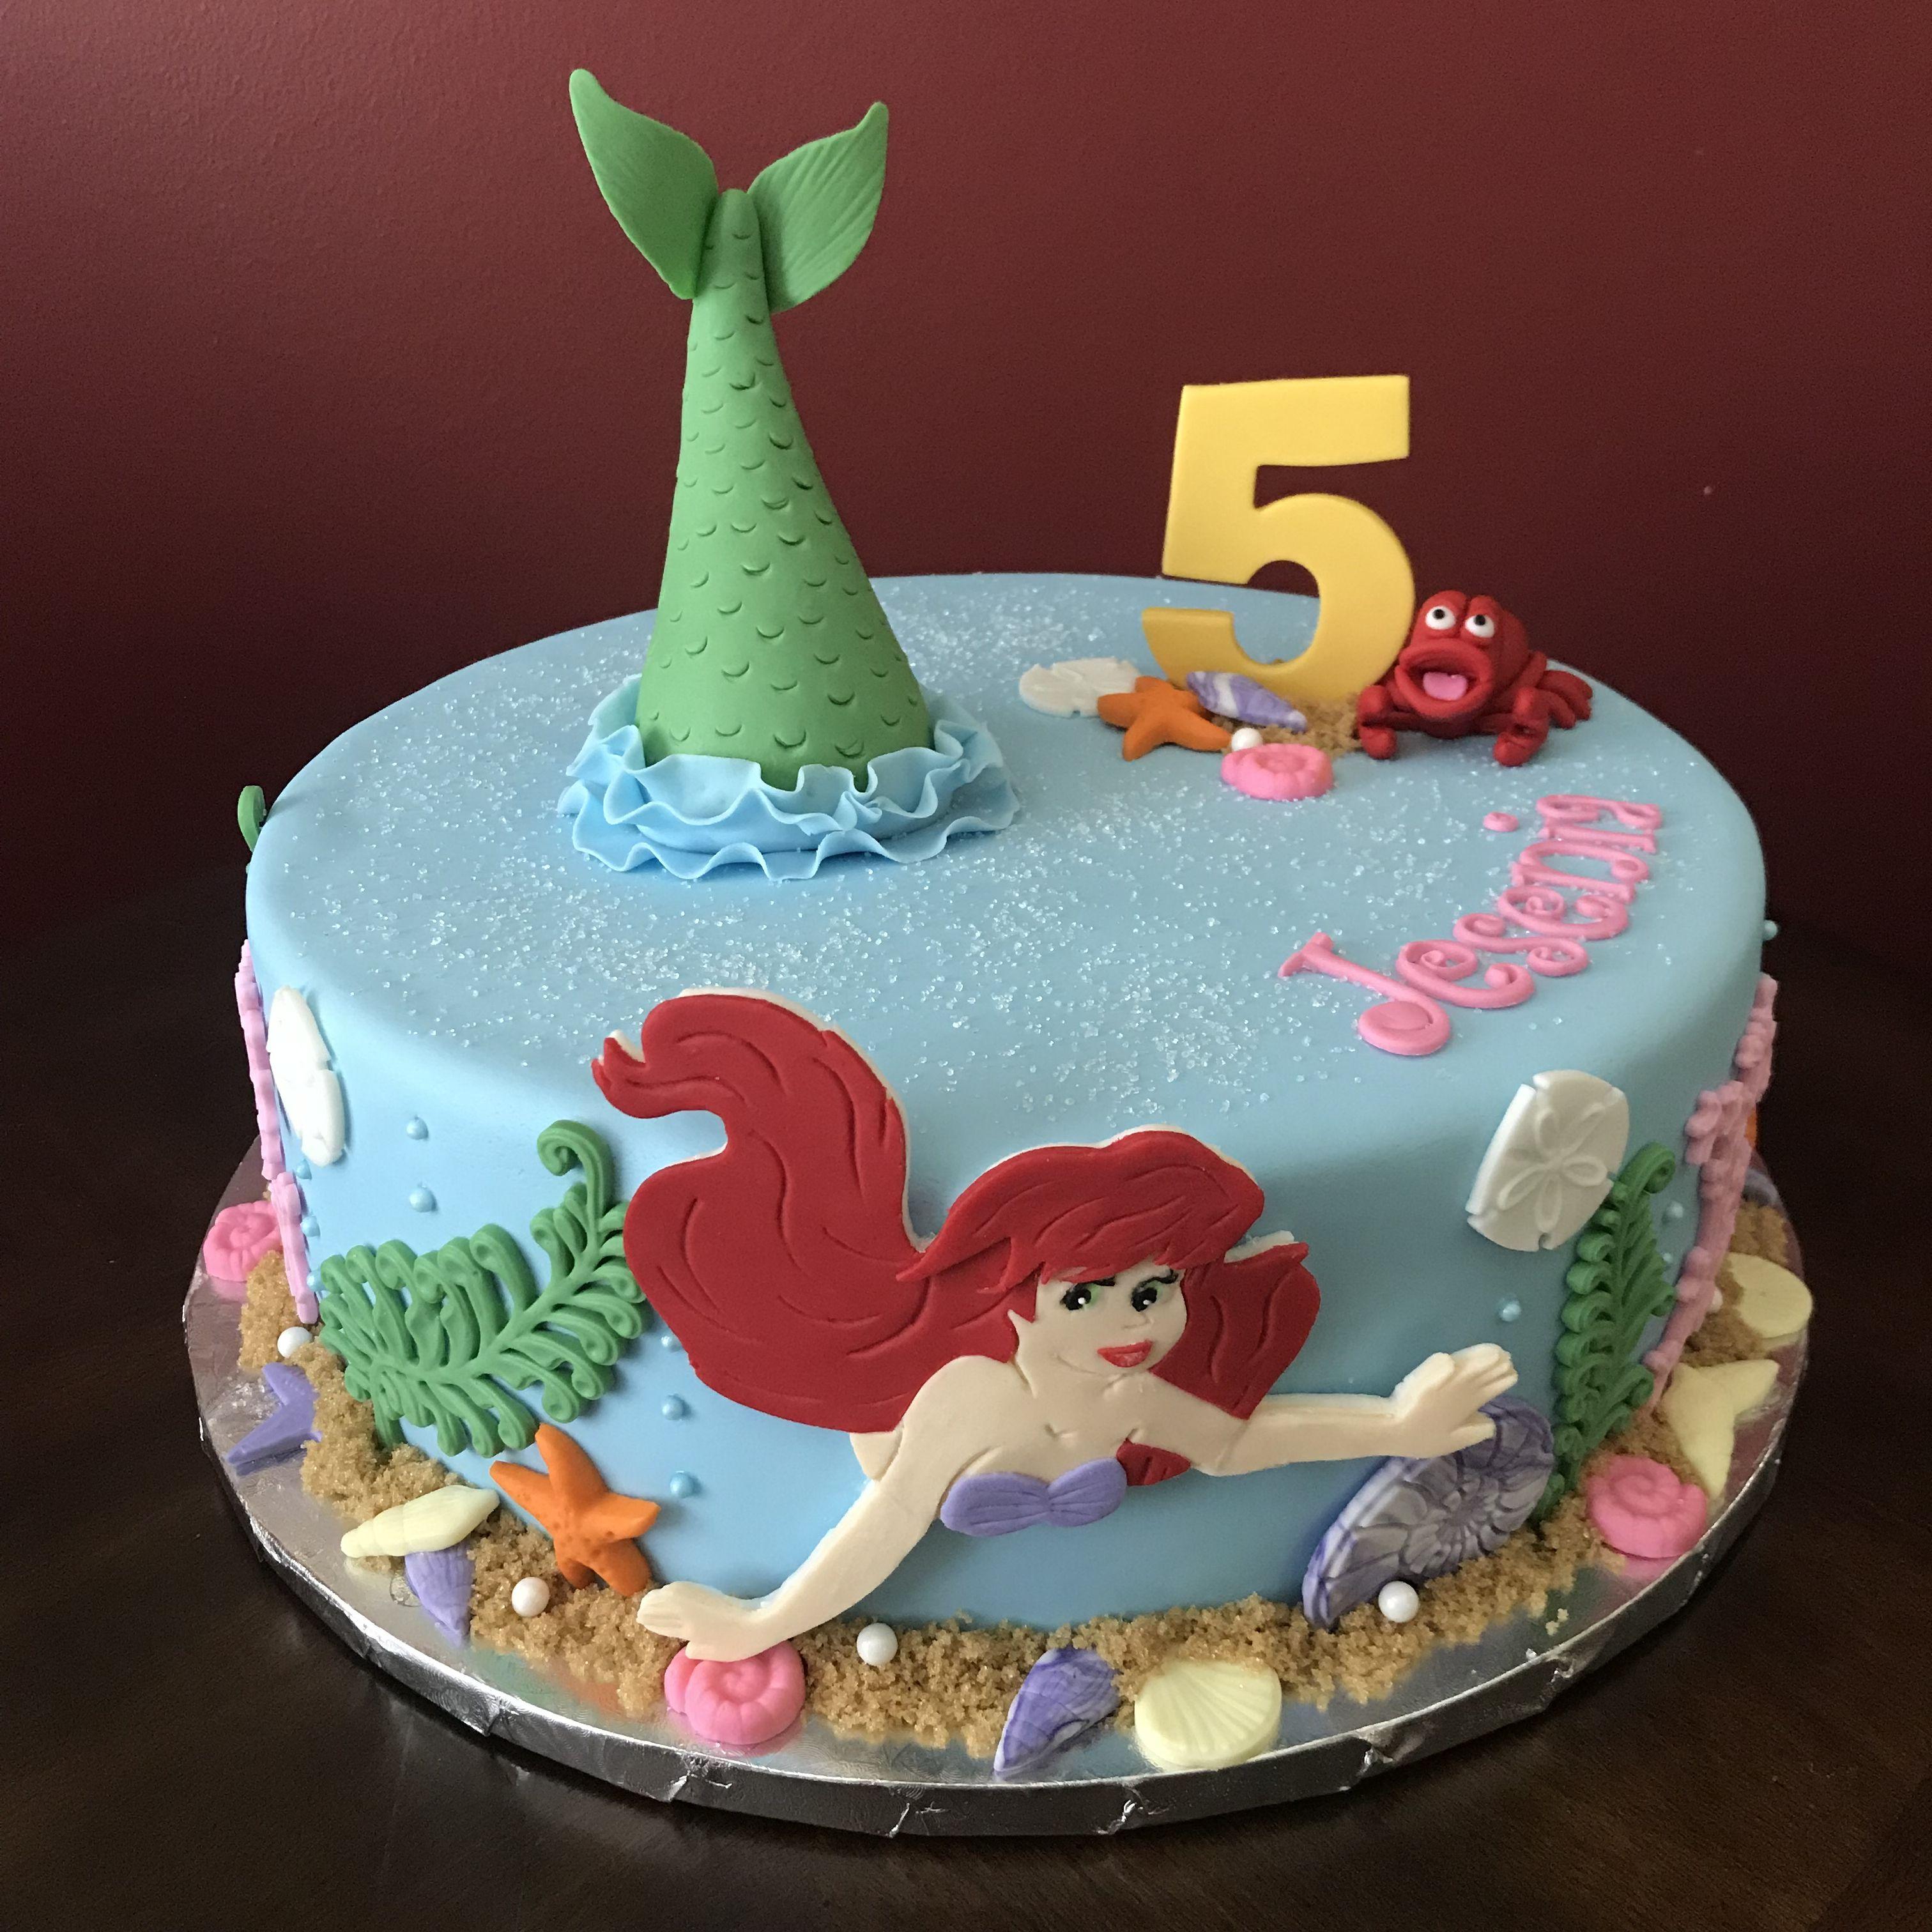 Ariel the little mermaid birthday cake mermaid birthday